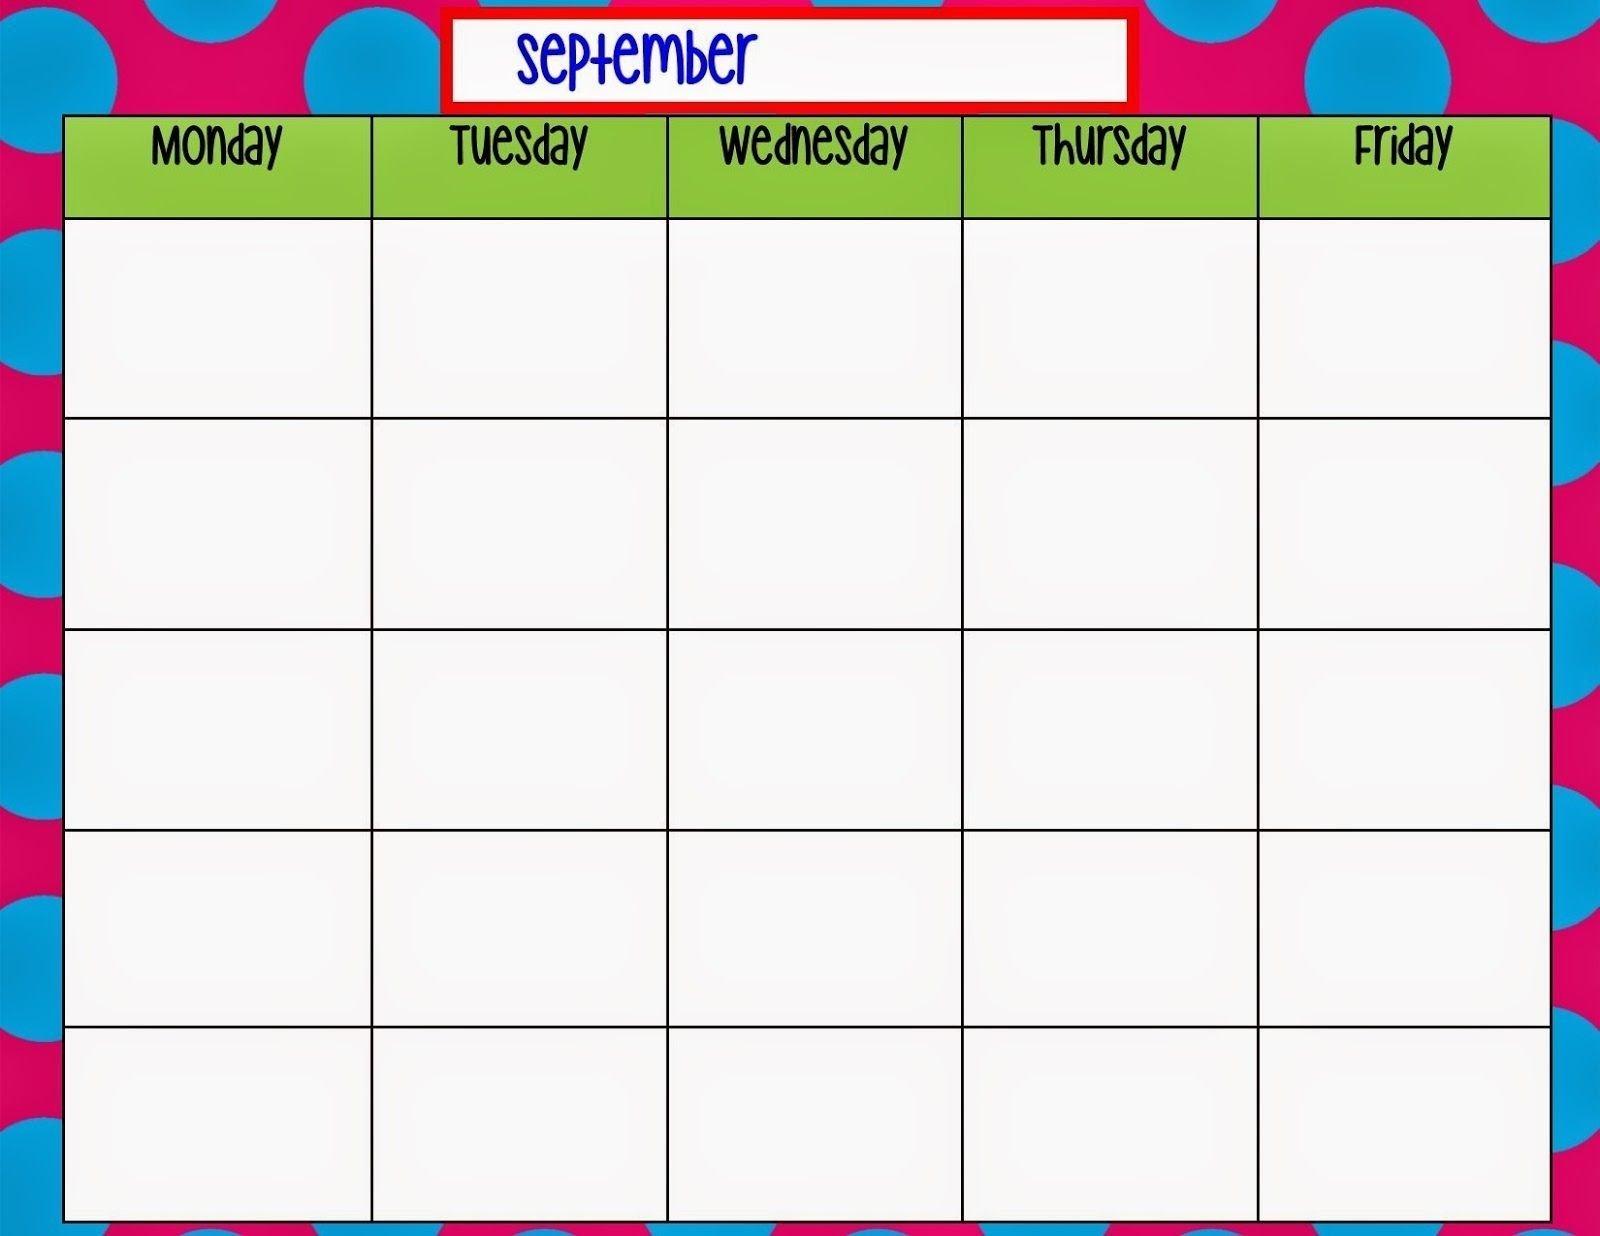 Extraordinary Monday Through Friday Word Calendar In 2020 Monday Through Friday Calendar Word